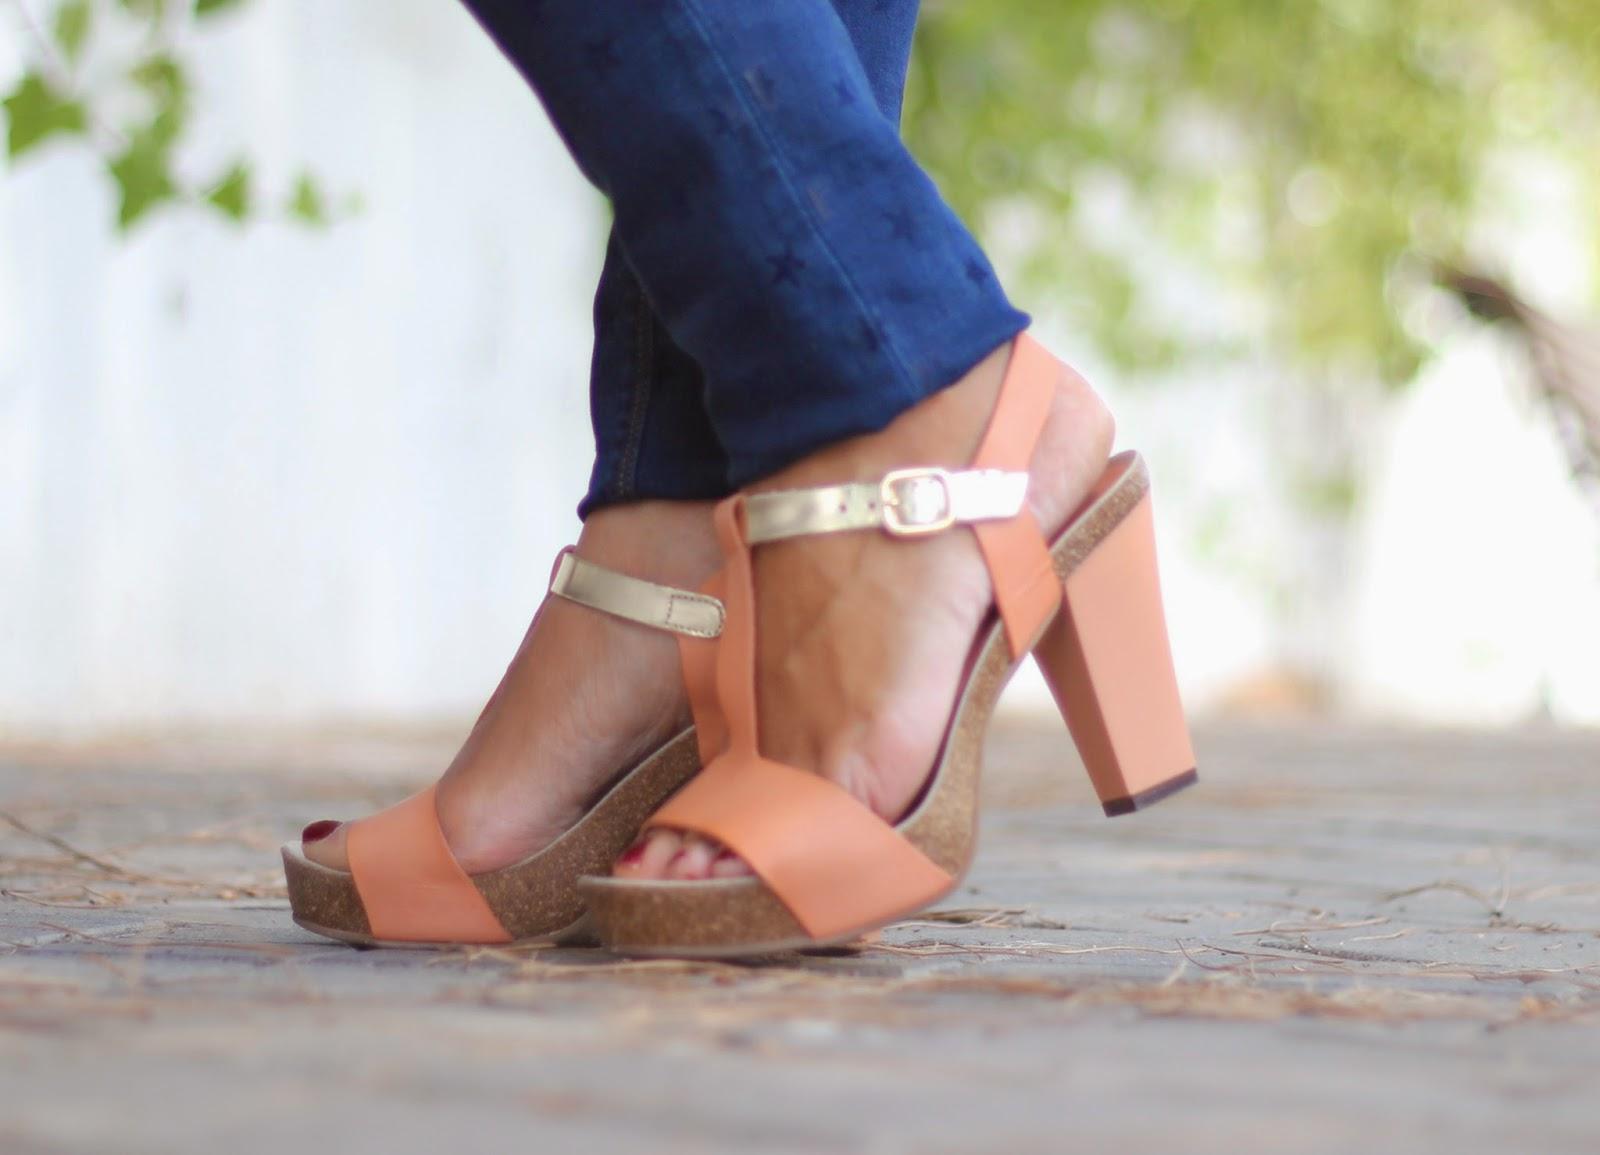 photo-look-street_style-stripes_shirt-stars_troussers-nude_shoes-papaya